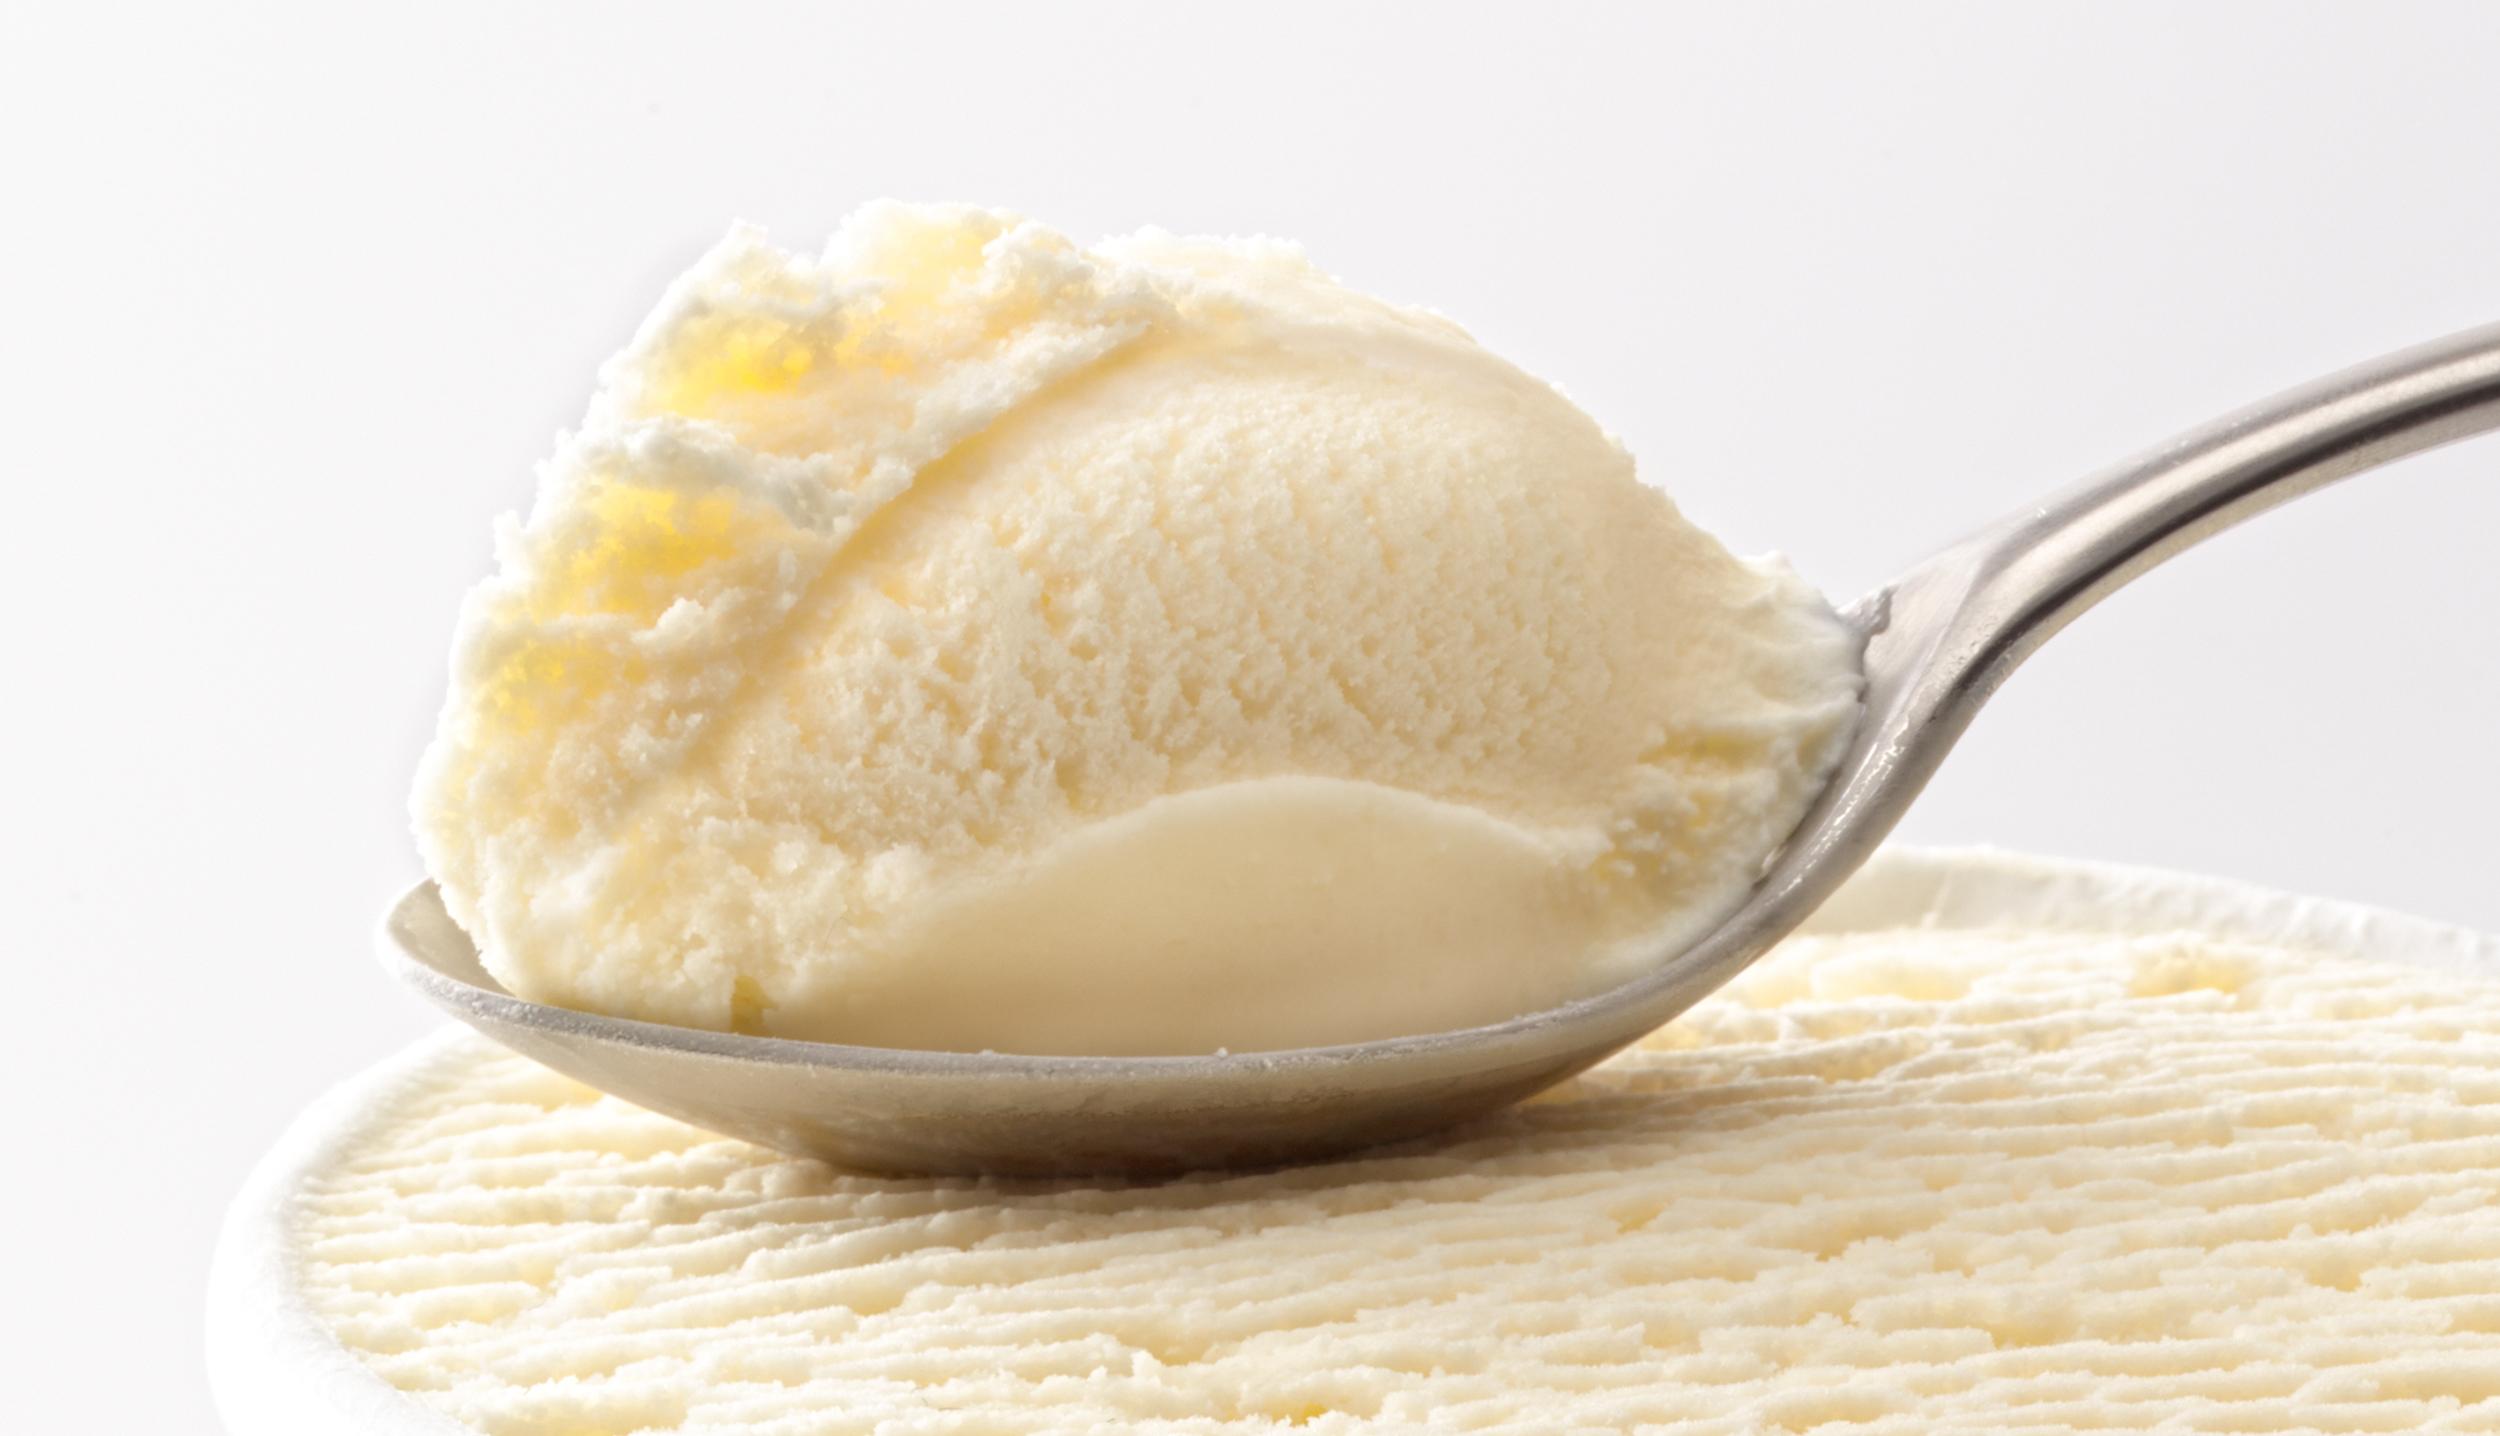 icecreamspoon.jpg